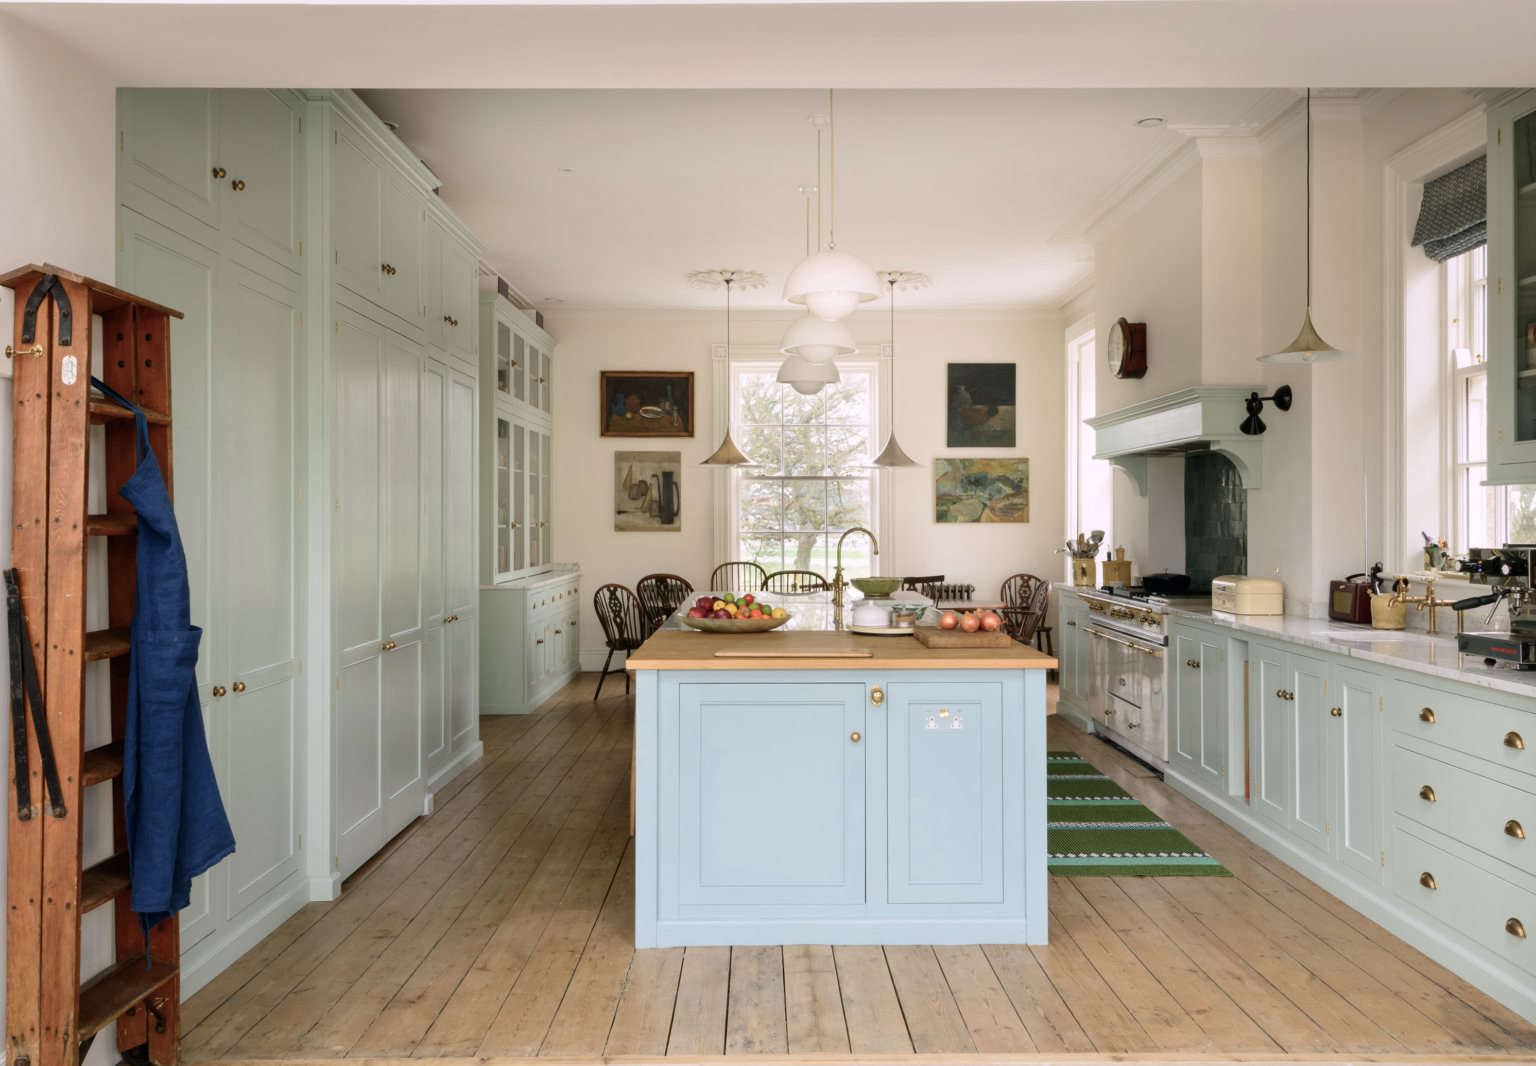 jones hunt york england townhouse kitchen by devol 1 hero